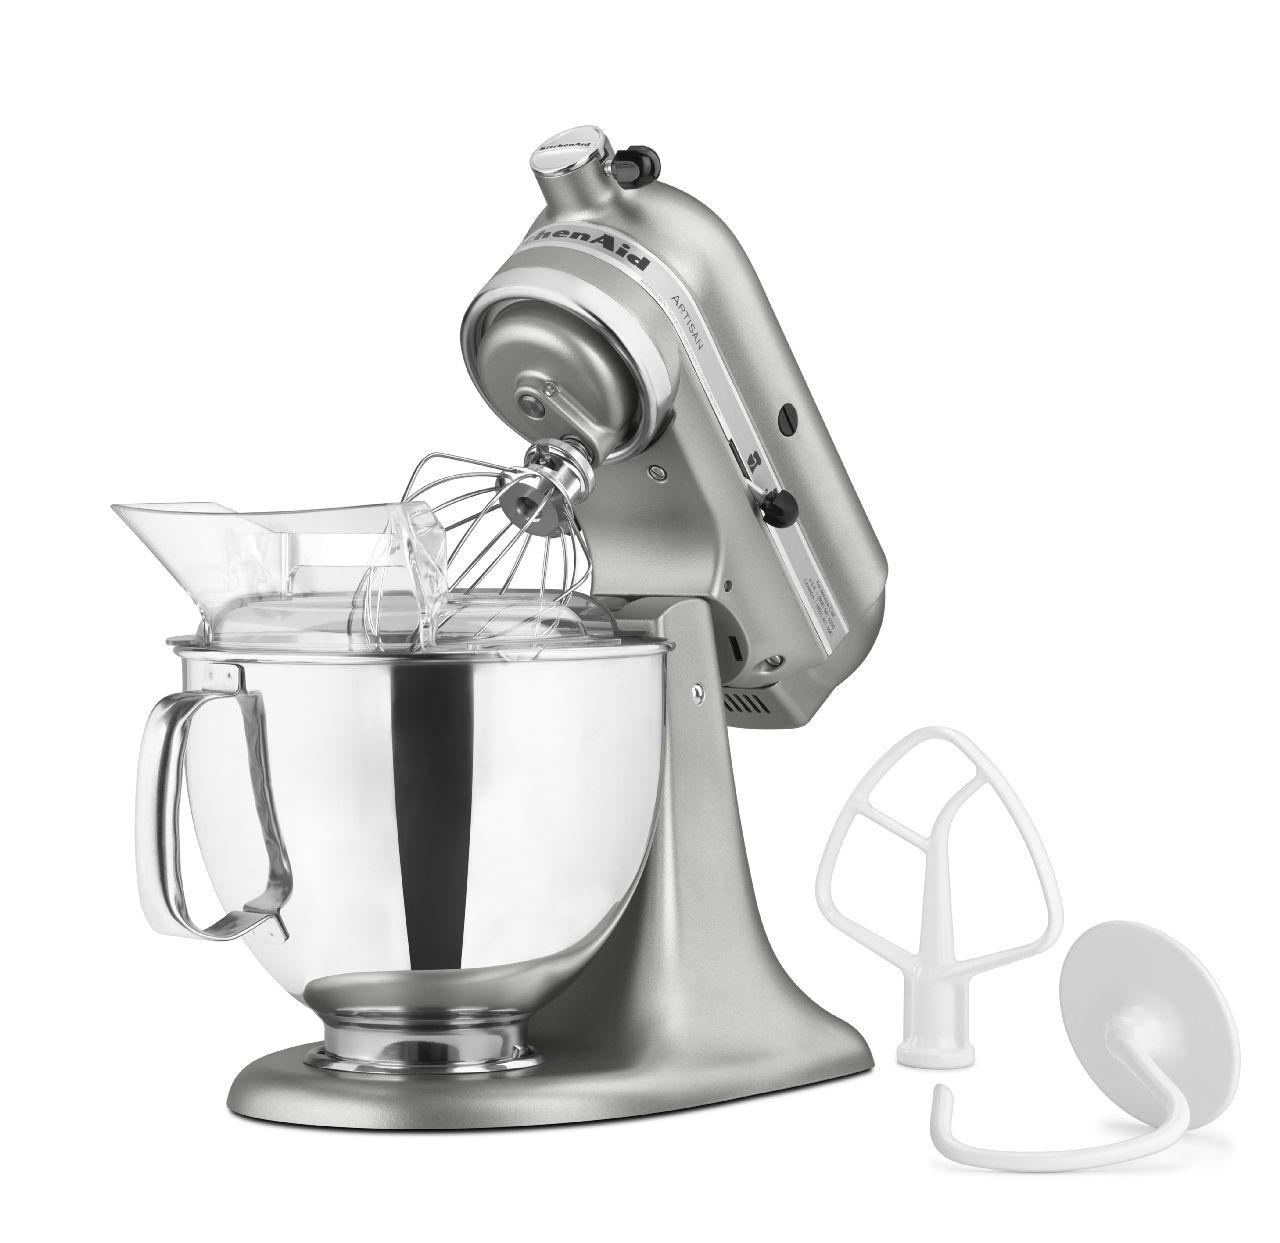 KitchenAid-Artisan-Series-5-Quart-Tilt-Head-Stand-Mixer-10-Speeds-KSM150PS thumbnail 44